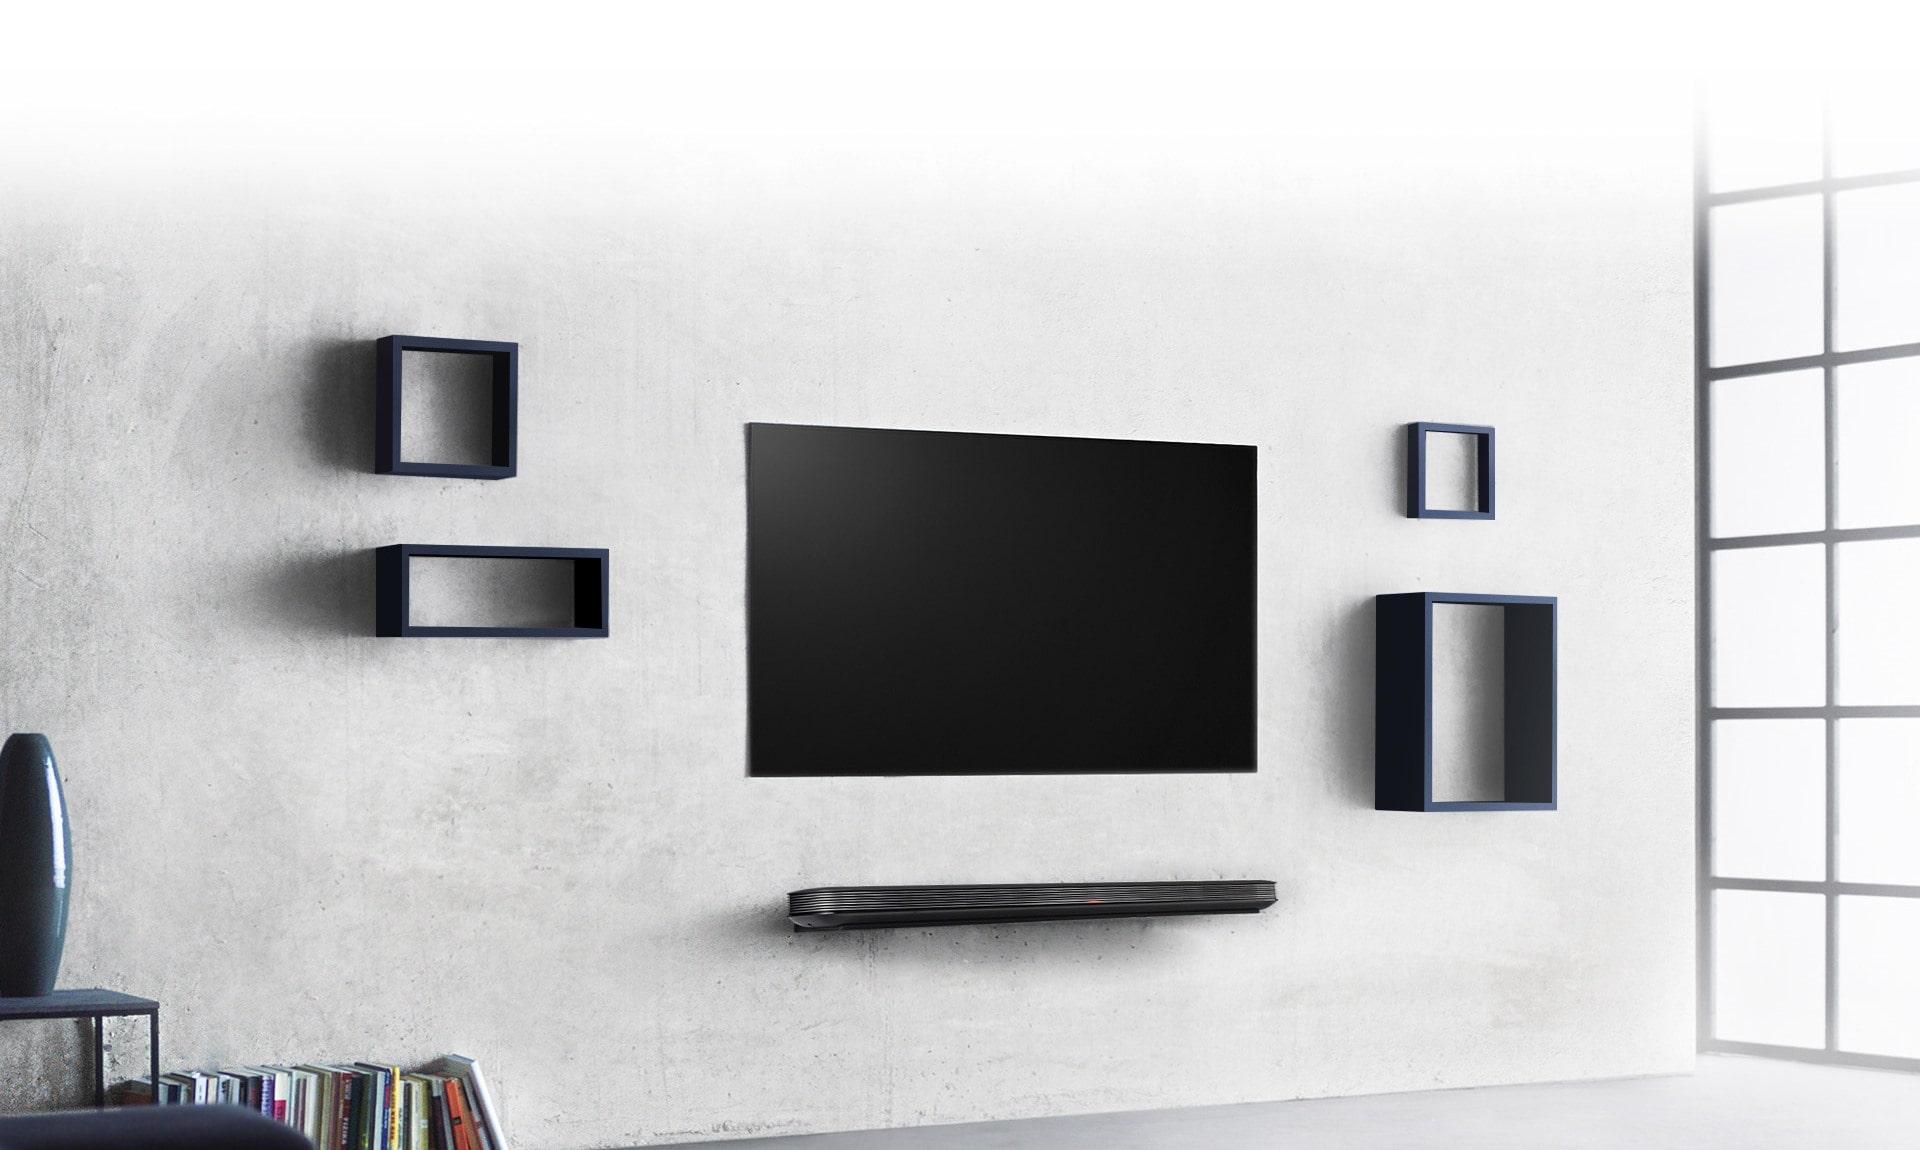 Best Living Room Design Lg Signature Wallpaper Oled Tv 65 Inch Lg Oled65w7t